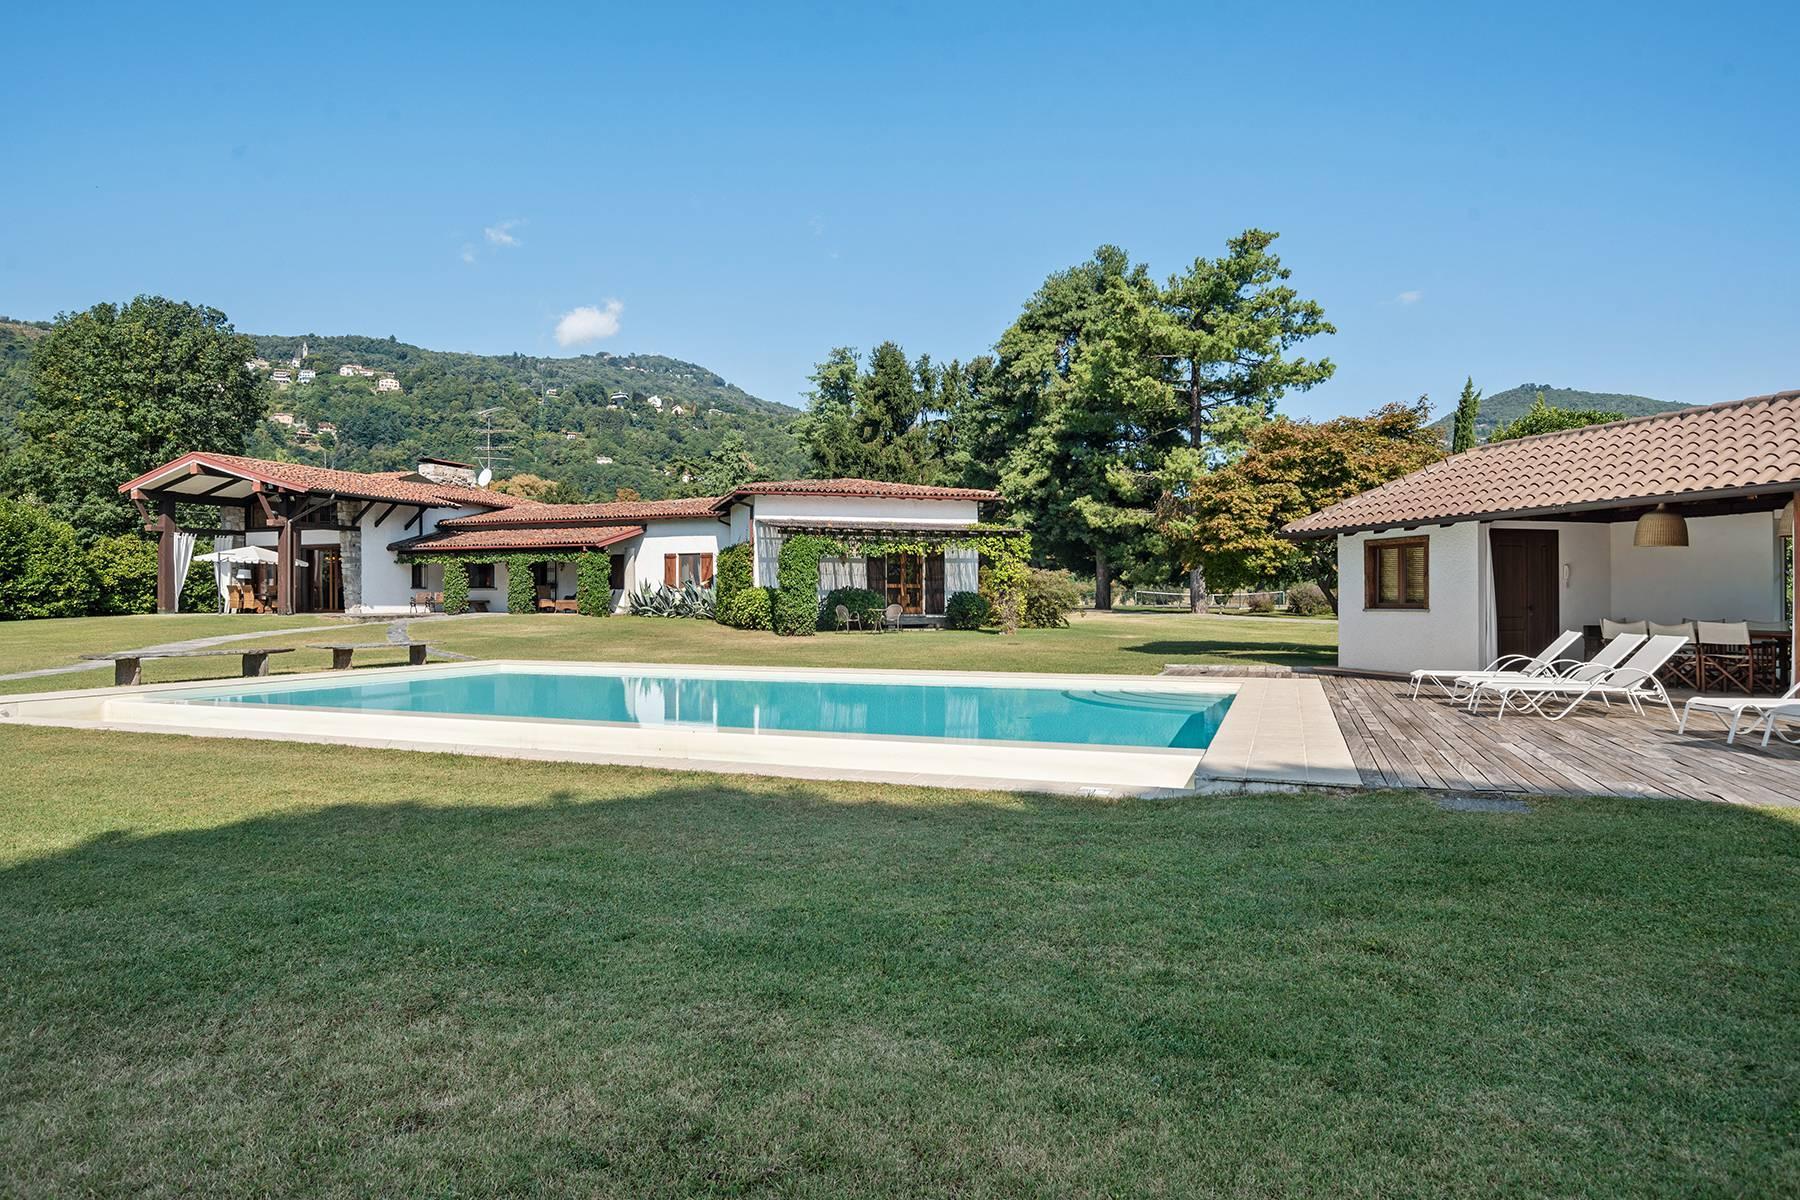 Charmante Villa in Lesa, mitten in der Natur - 12